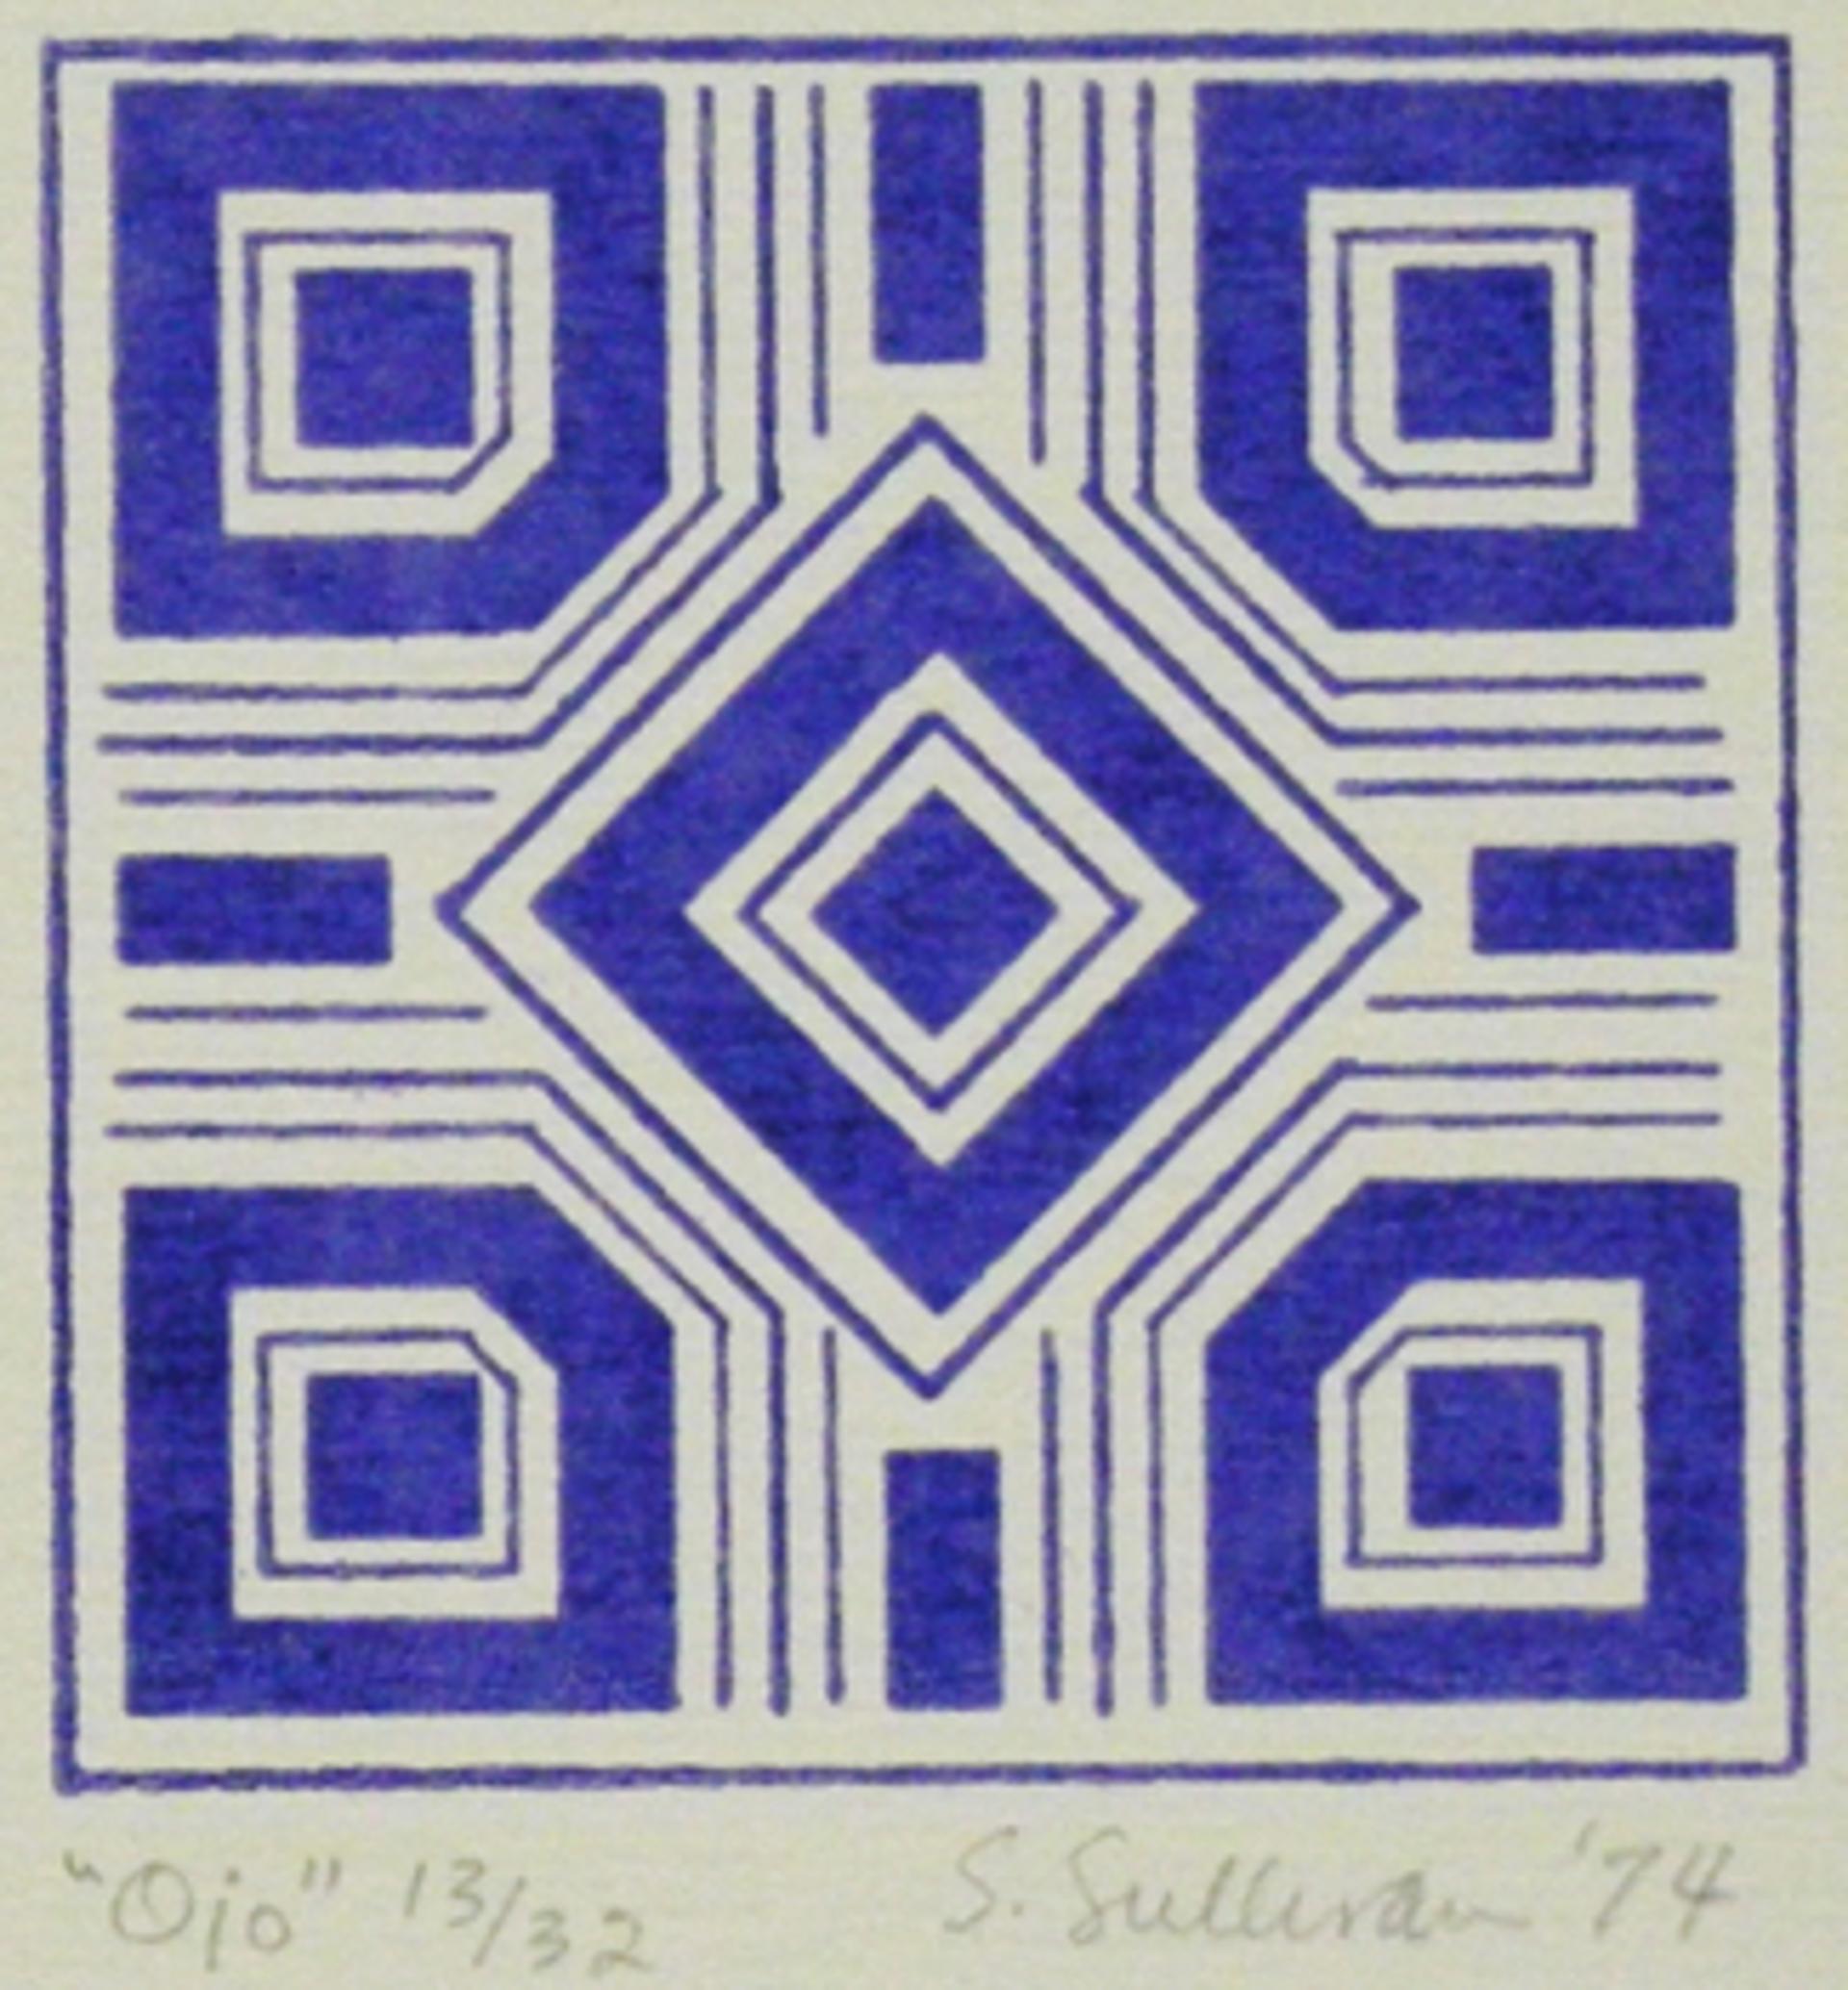 Ojo by Stella Sullivan Prints